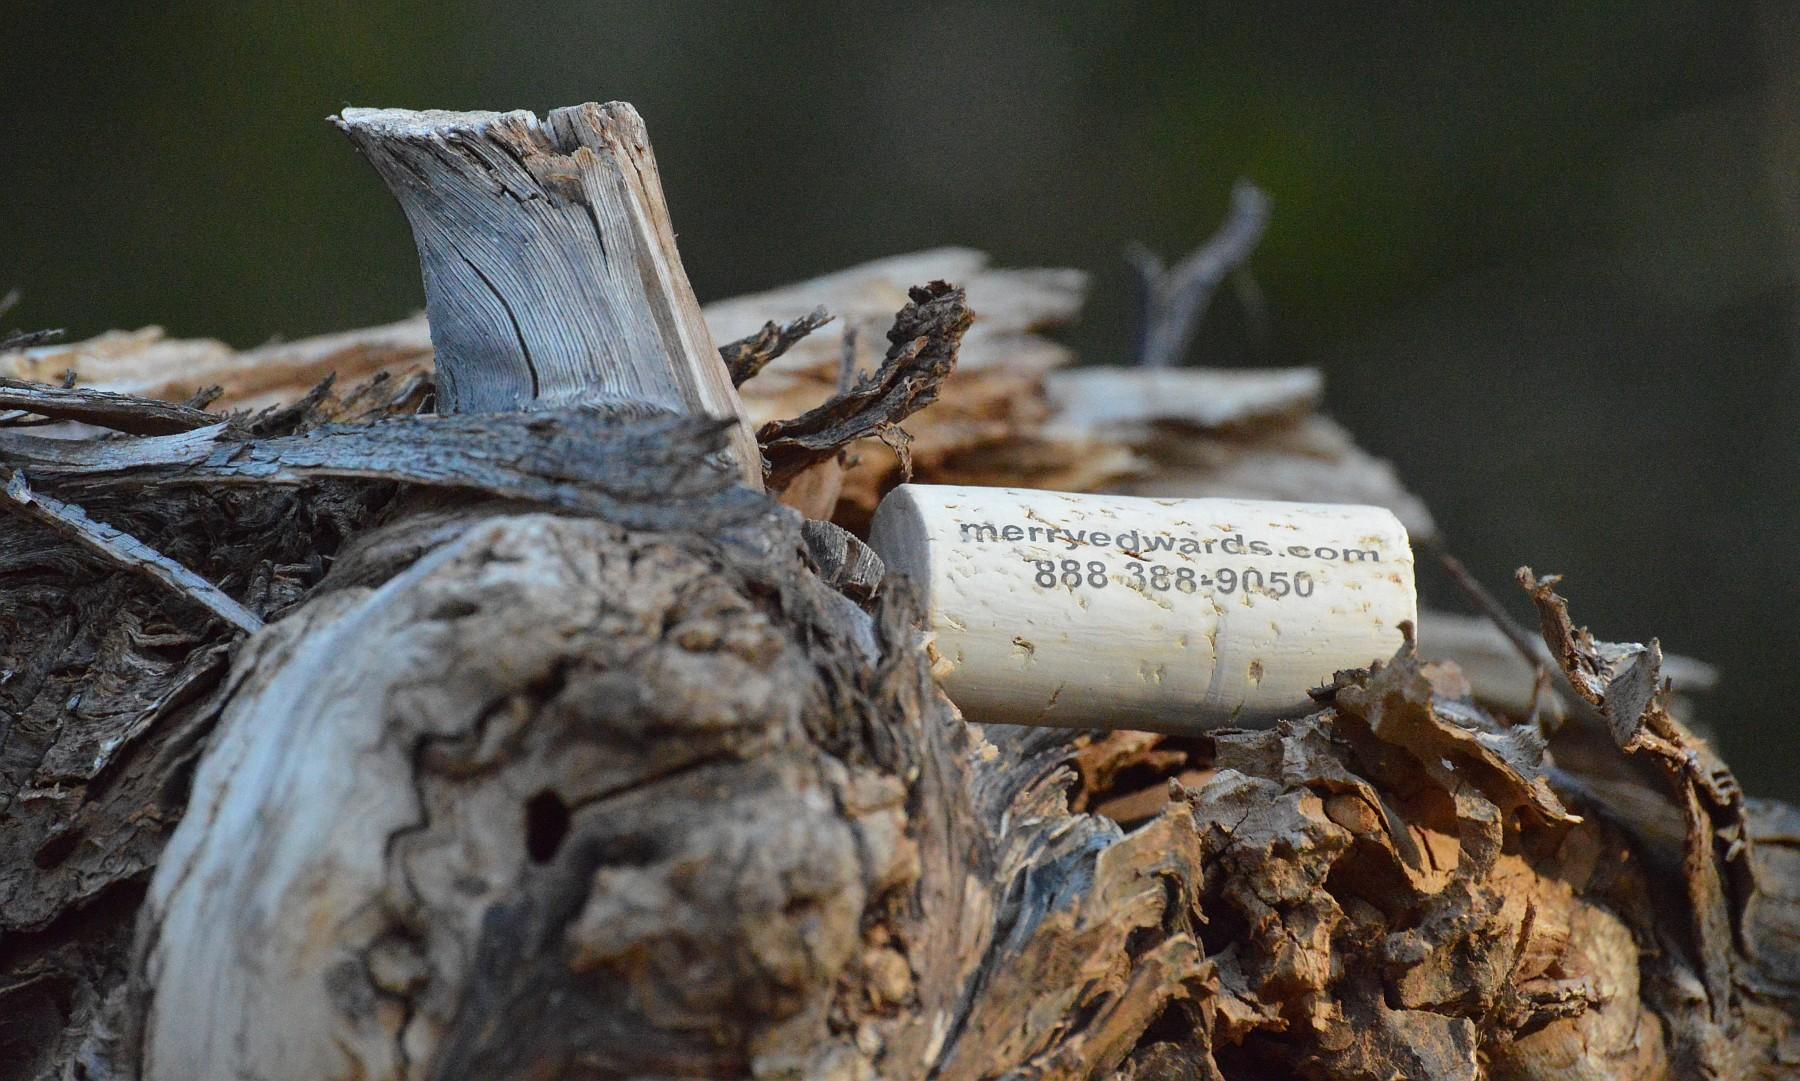 Merry Edwards Sauvignon Blanc cork